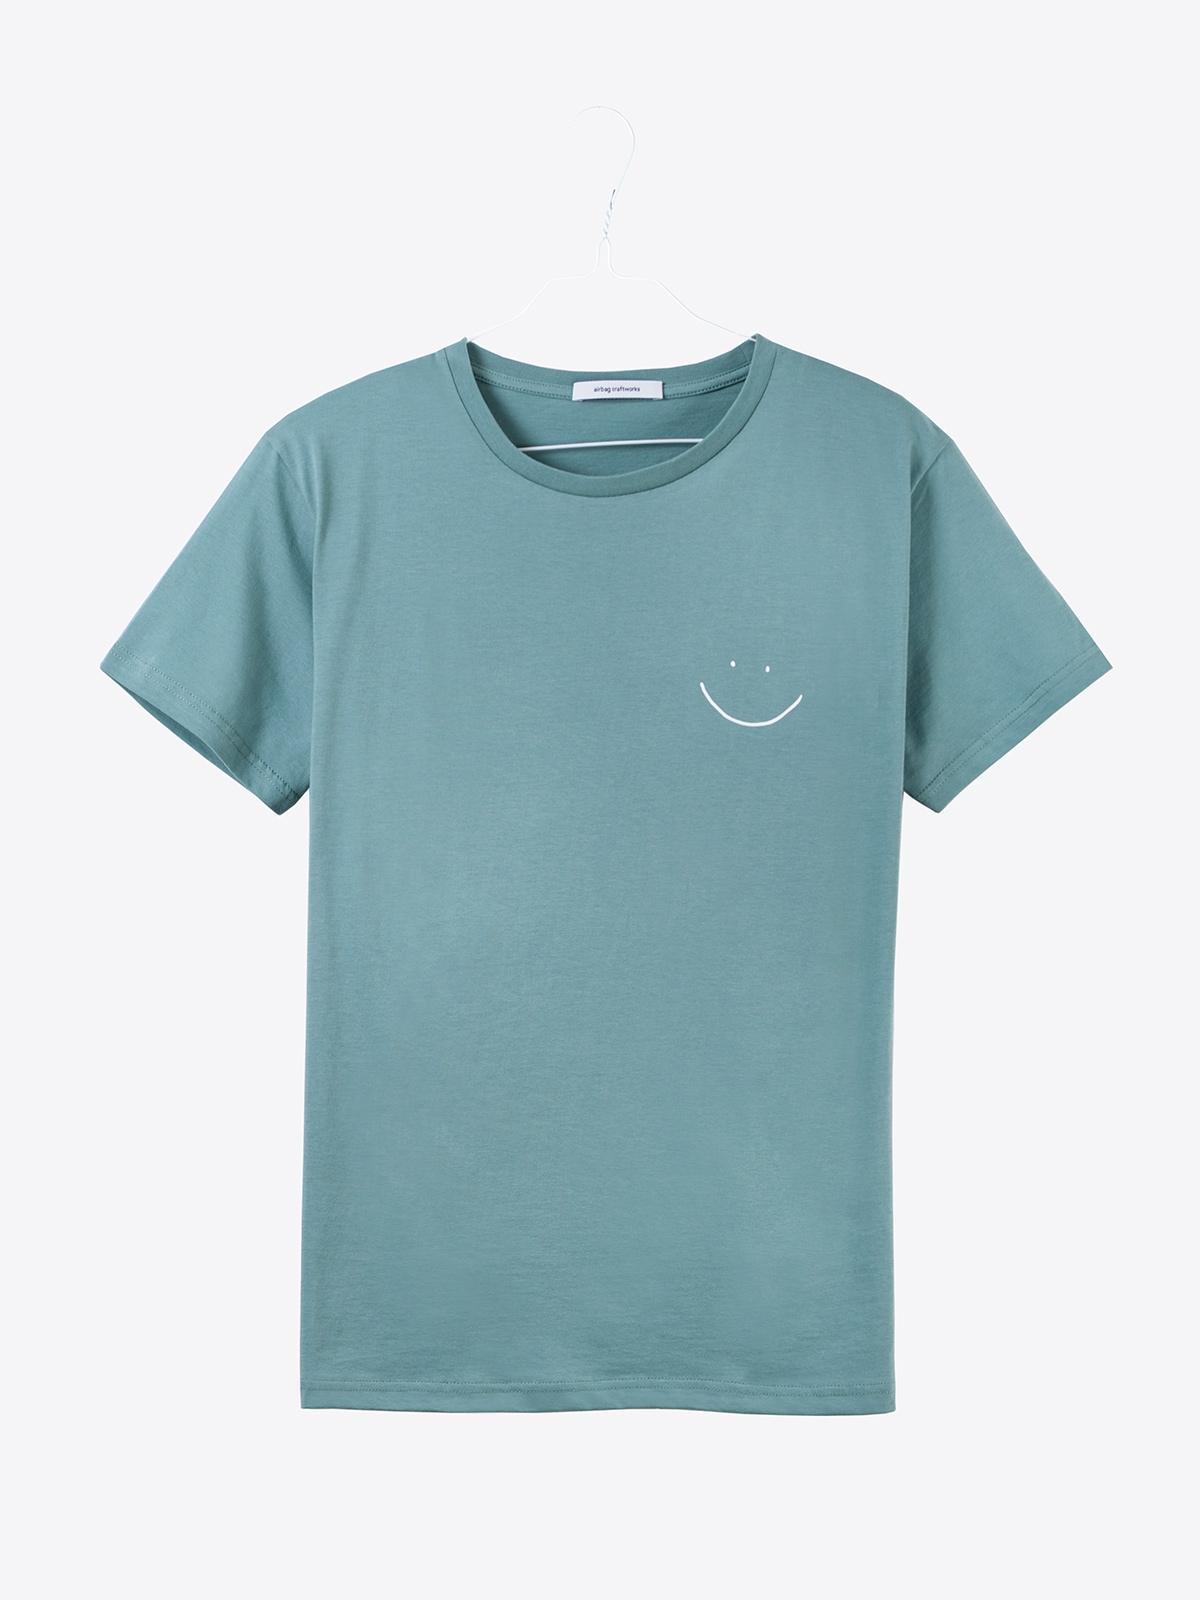 A2 simply happy | mint grey